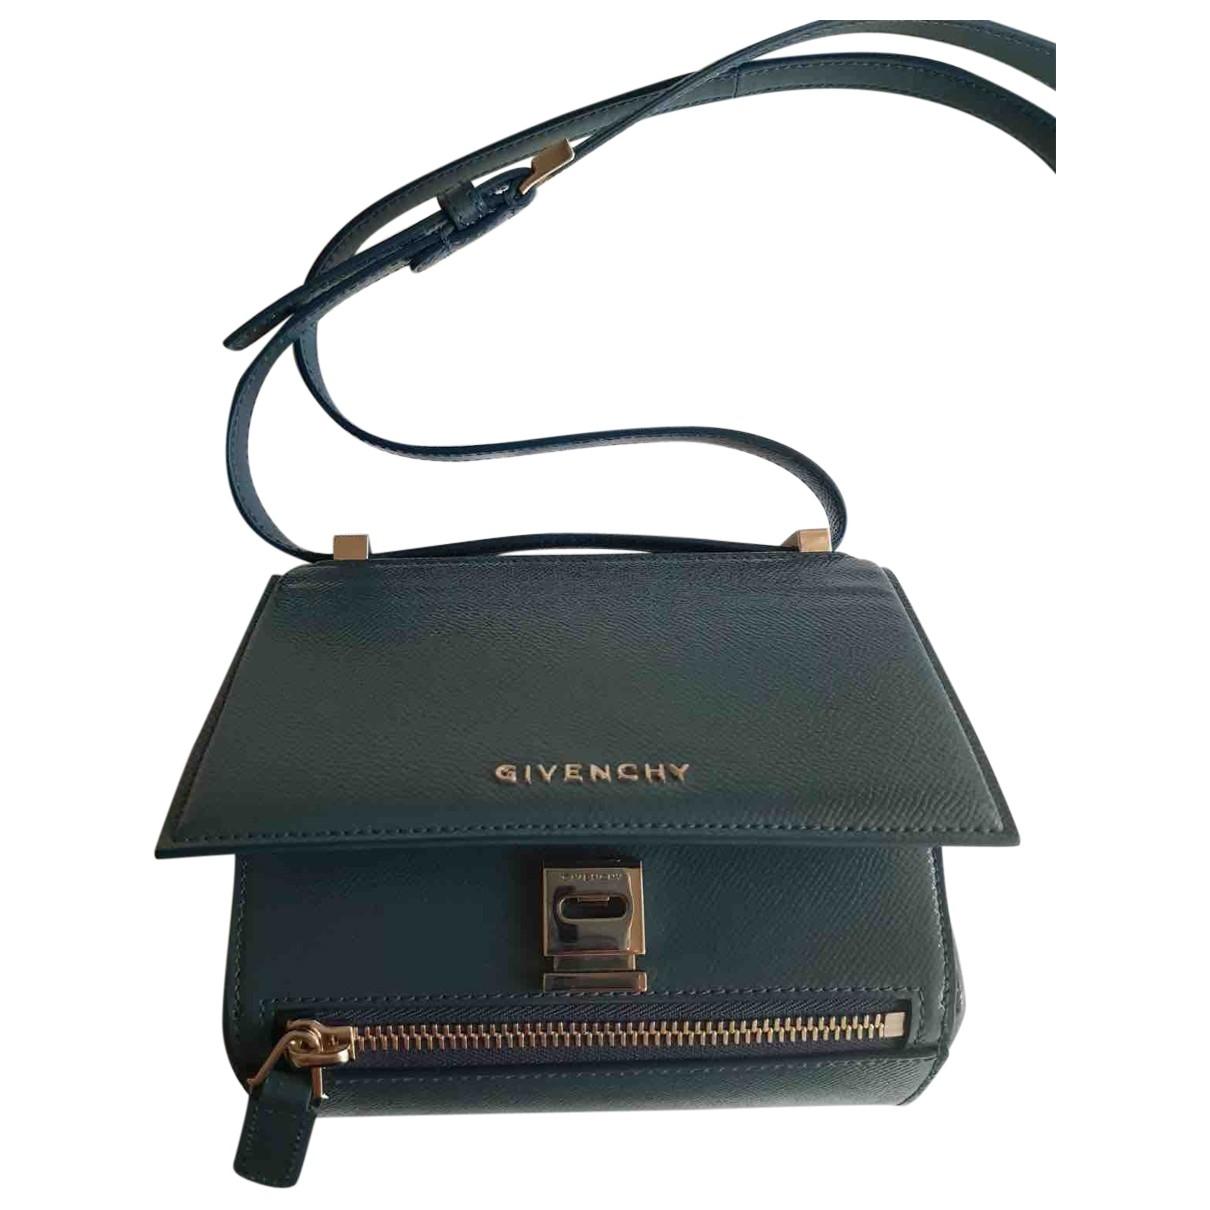 Givenchy Pandora Box Blue Patent leather handbag for Women \N